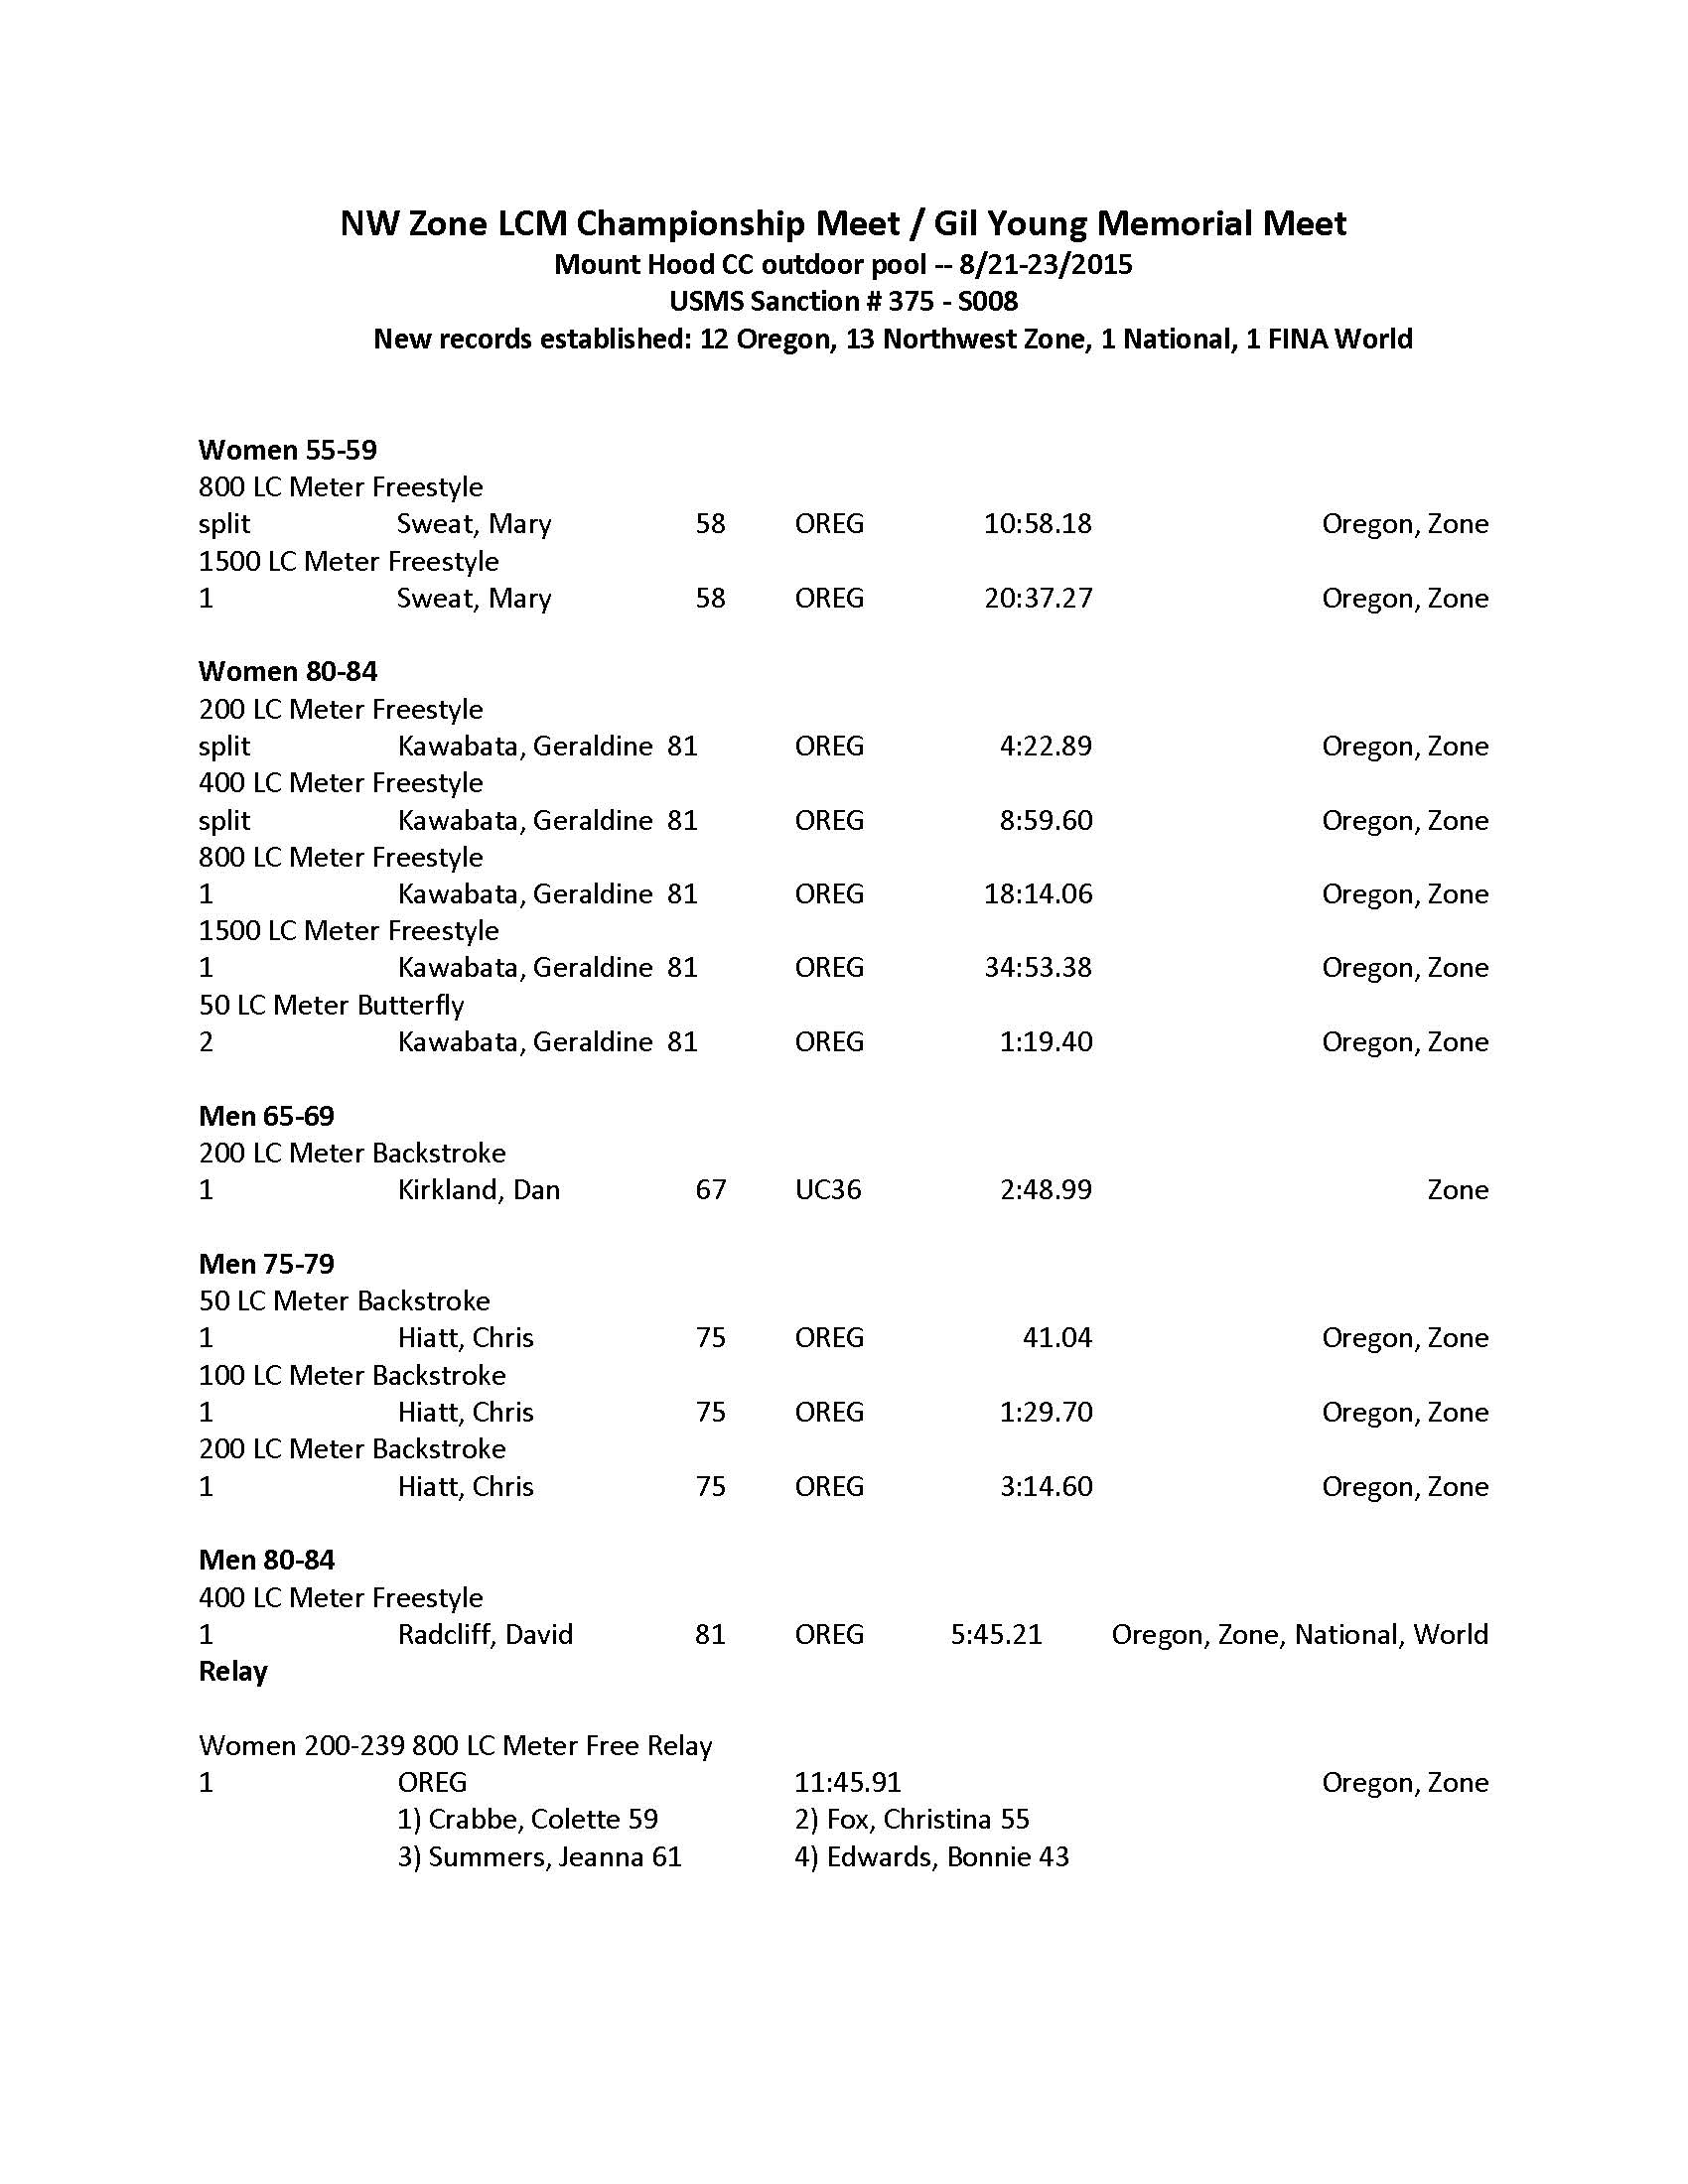 gil young memorial swim meet 2012 calendar